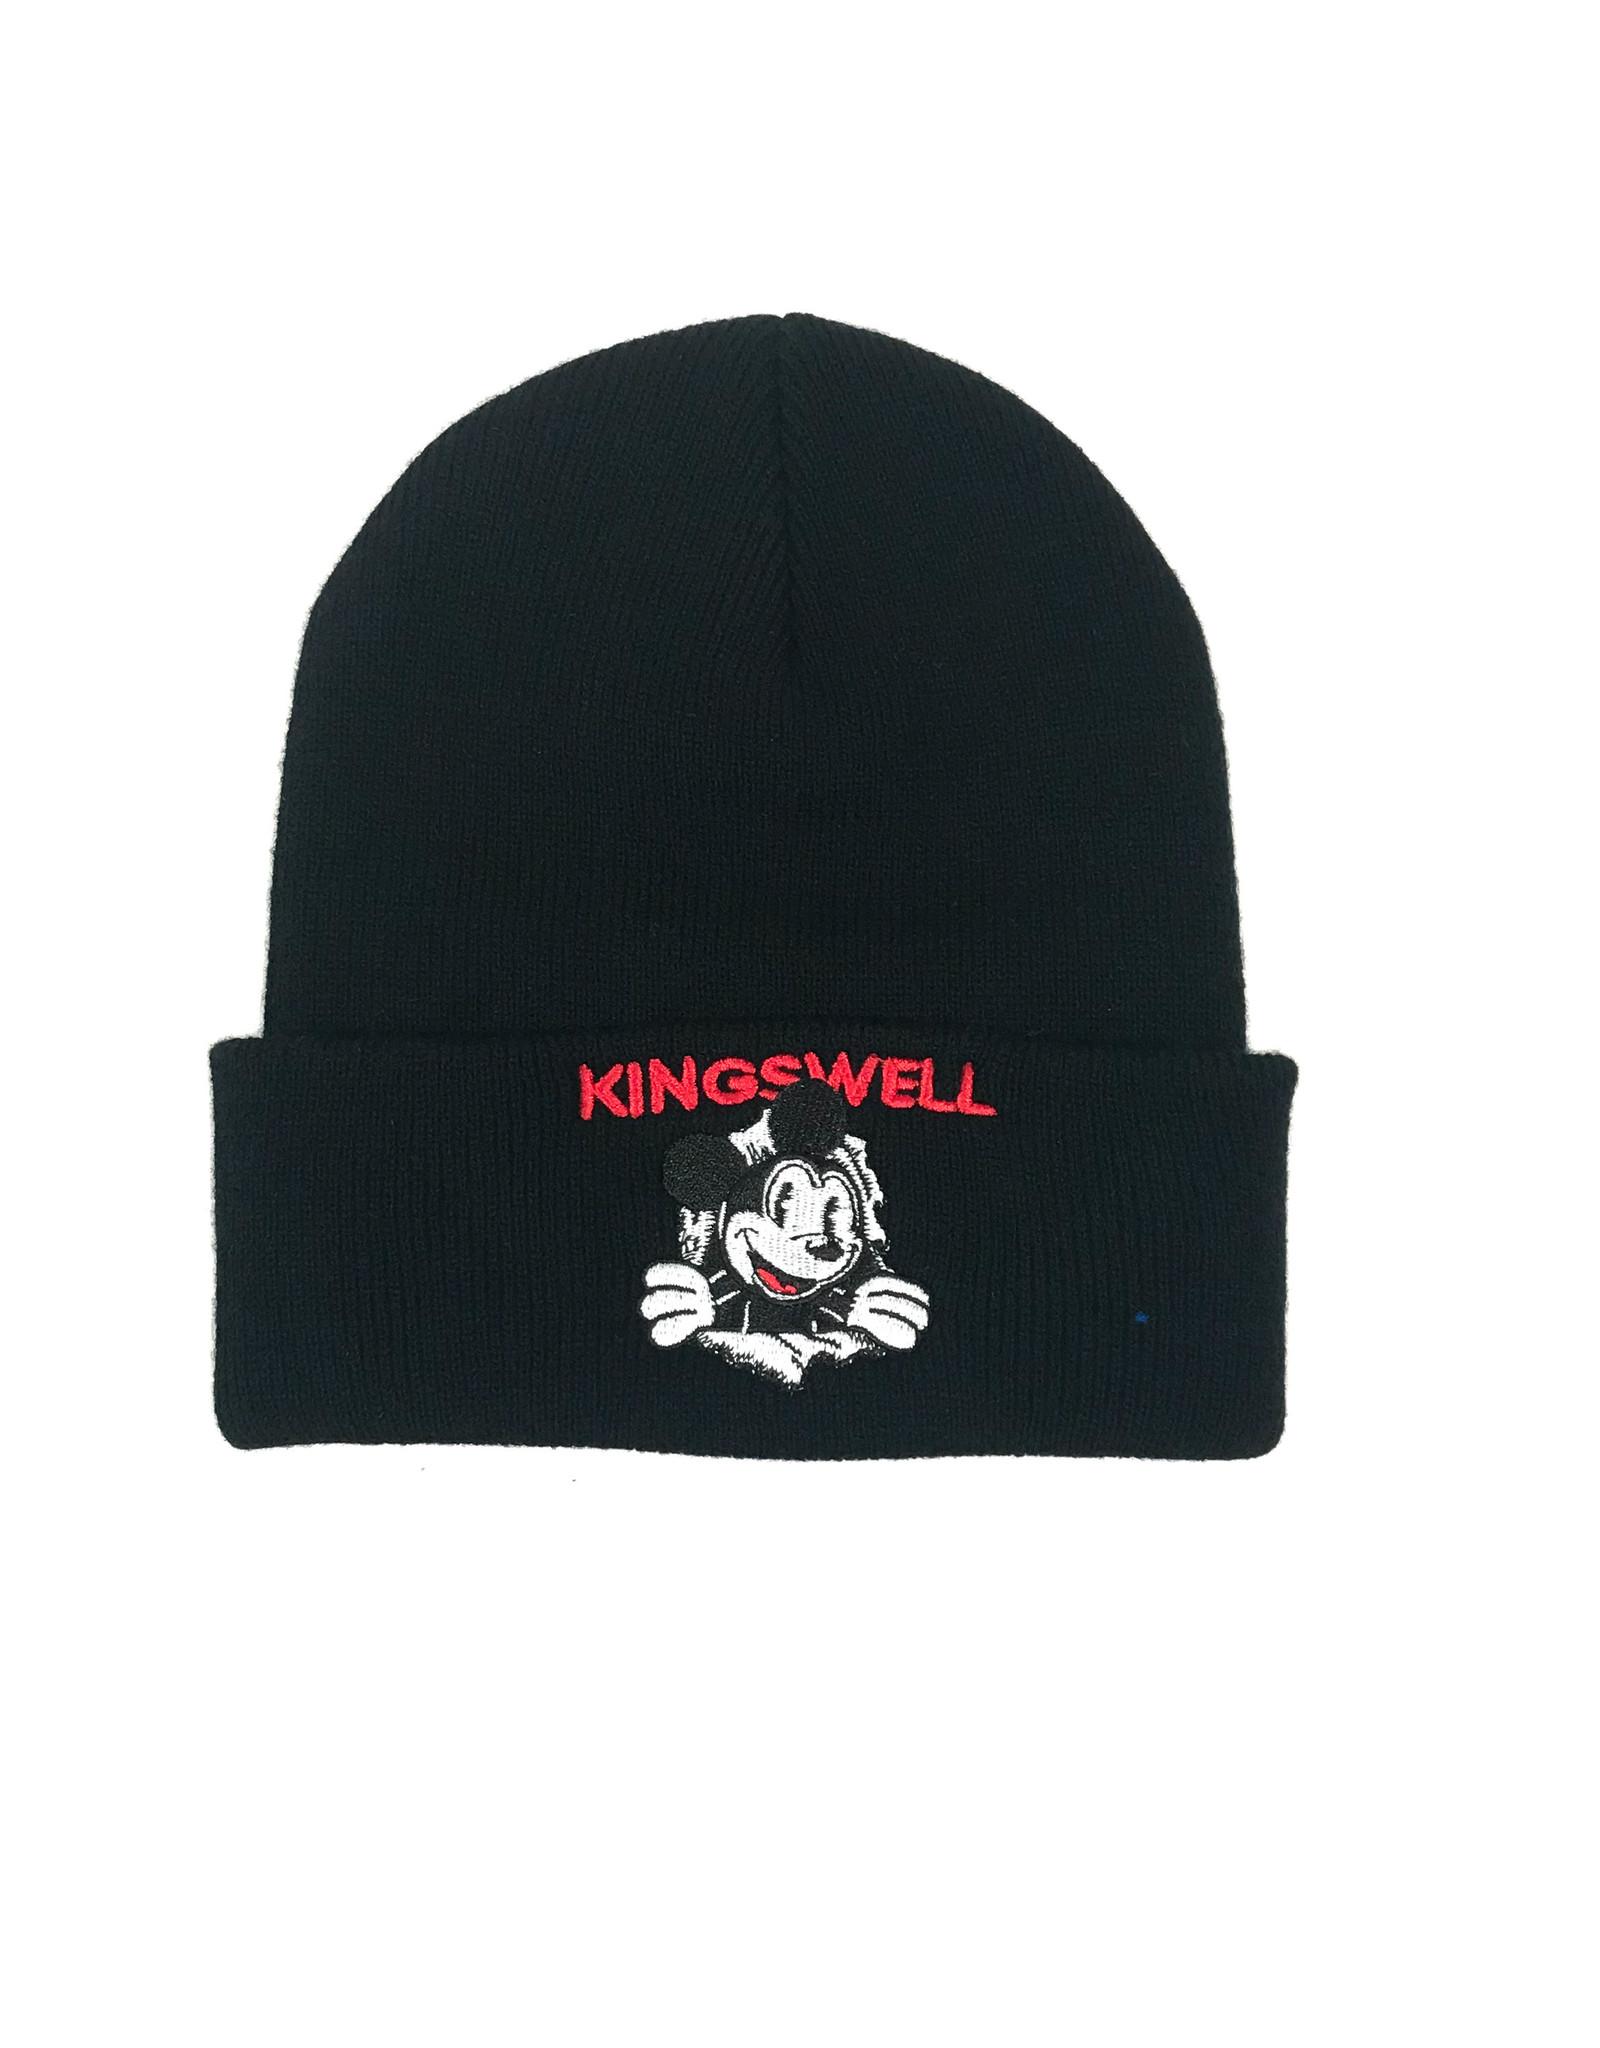 KINGSWELL KINGSWELL MOUSE RIPPER BEANIE - BLACK